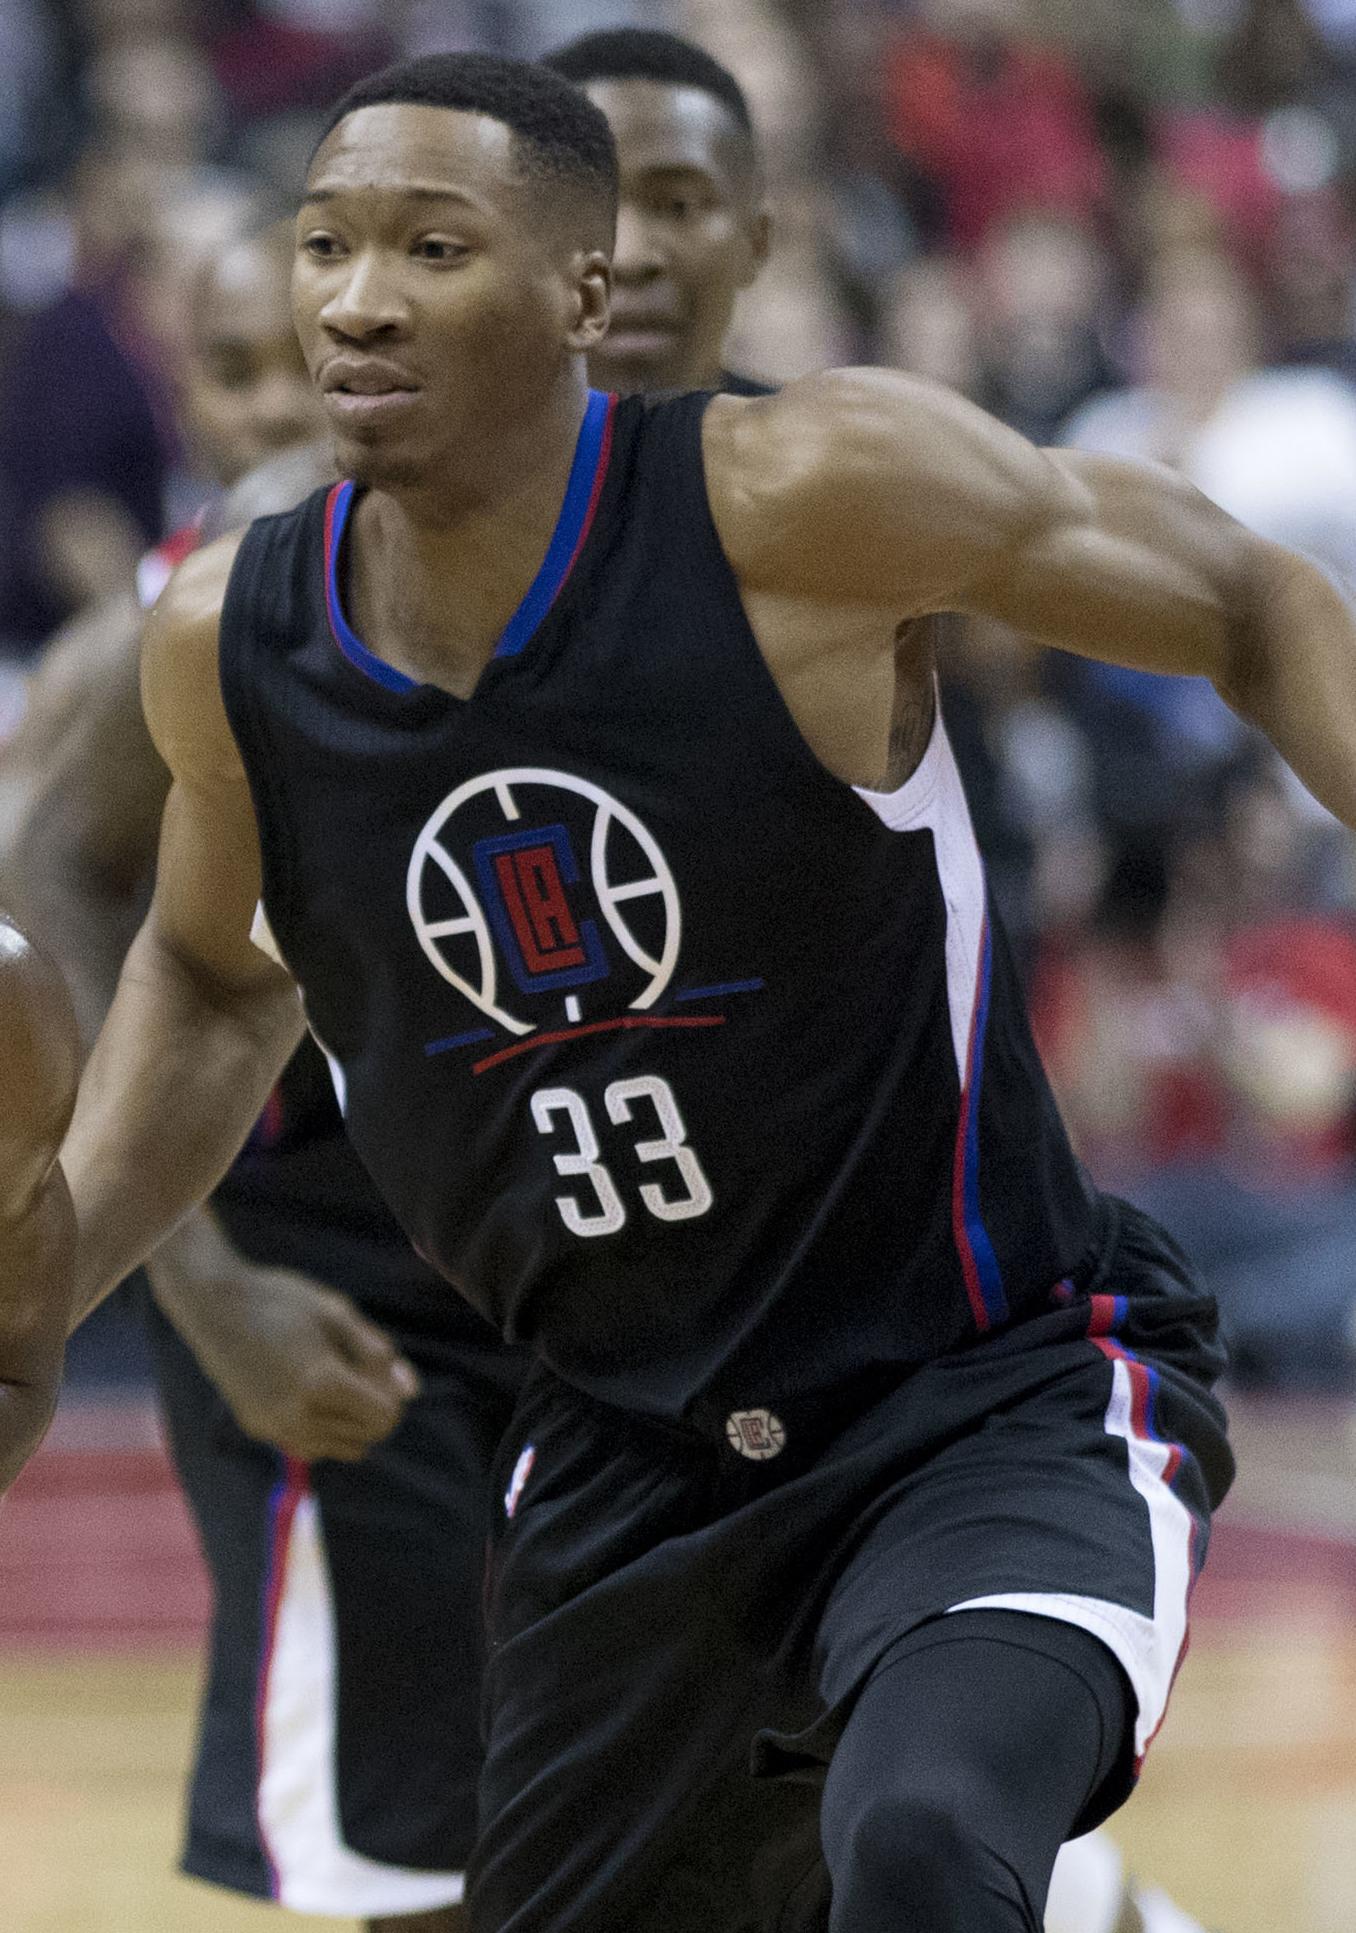 Alexis Texas Wikipedia wesley johnson (basketball) - wikipedia